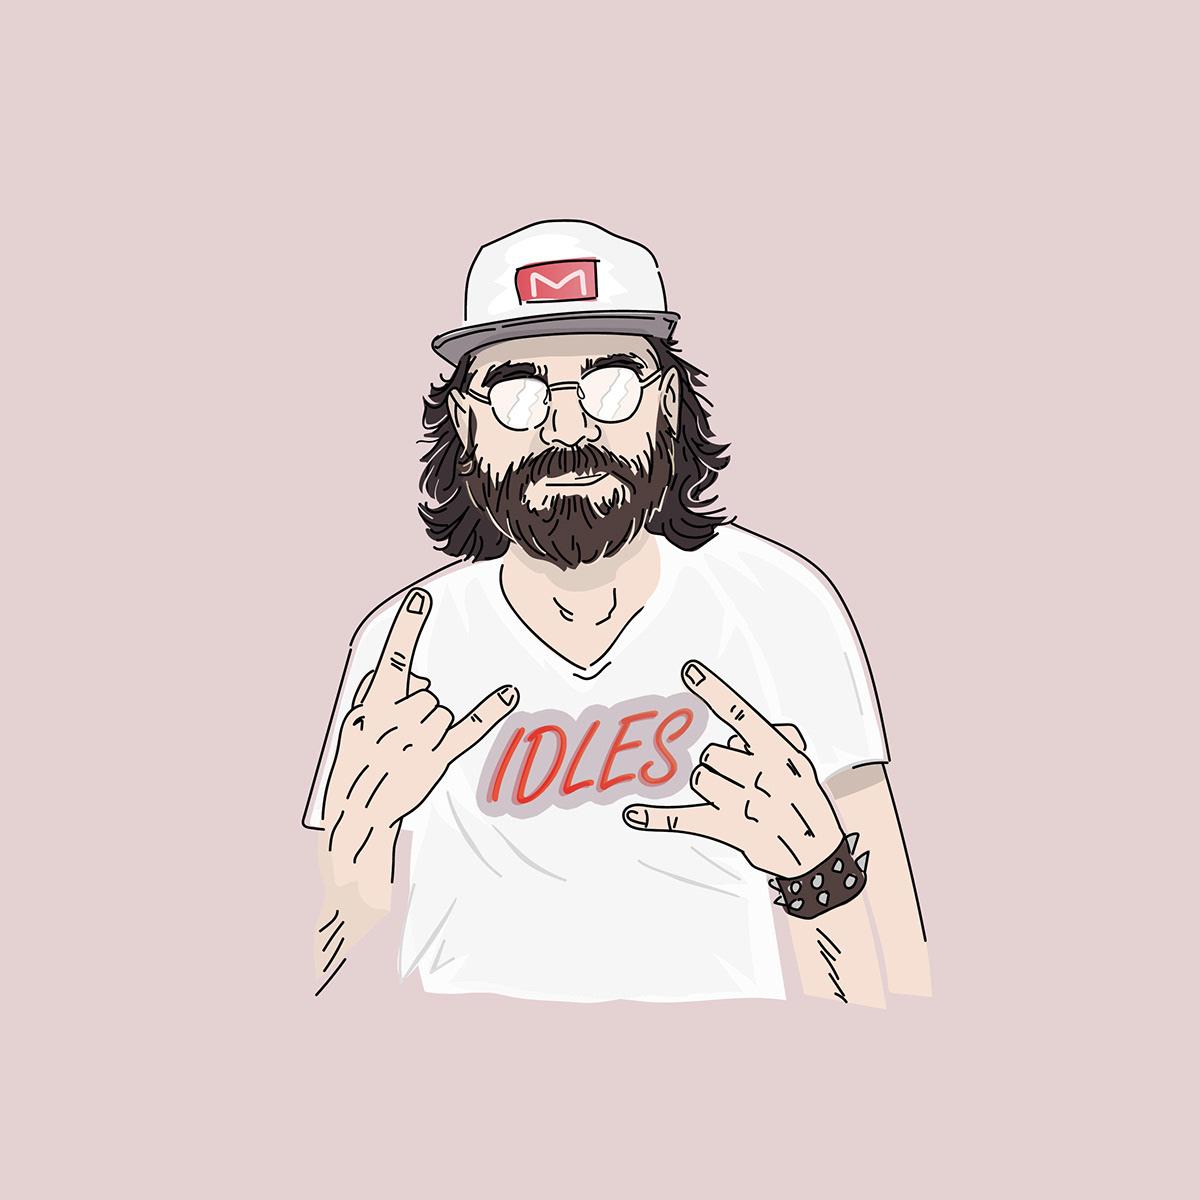 ILLUSTRATION  band Idles franko schiermeyer vector cool Hipster fresh poster beard